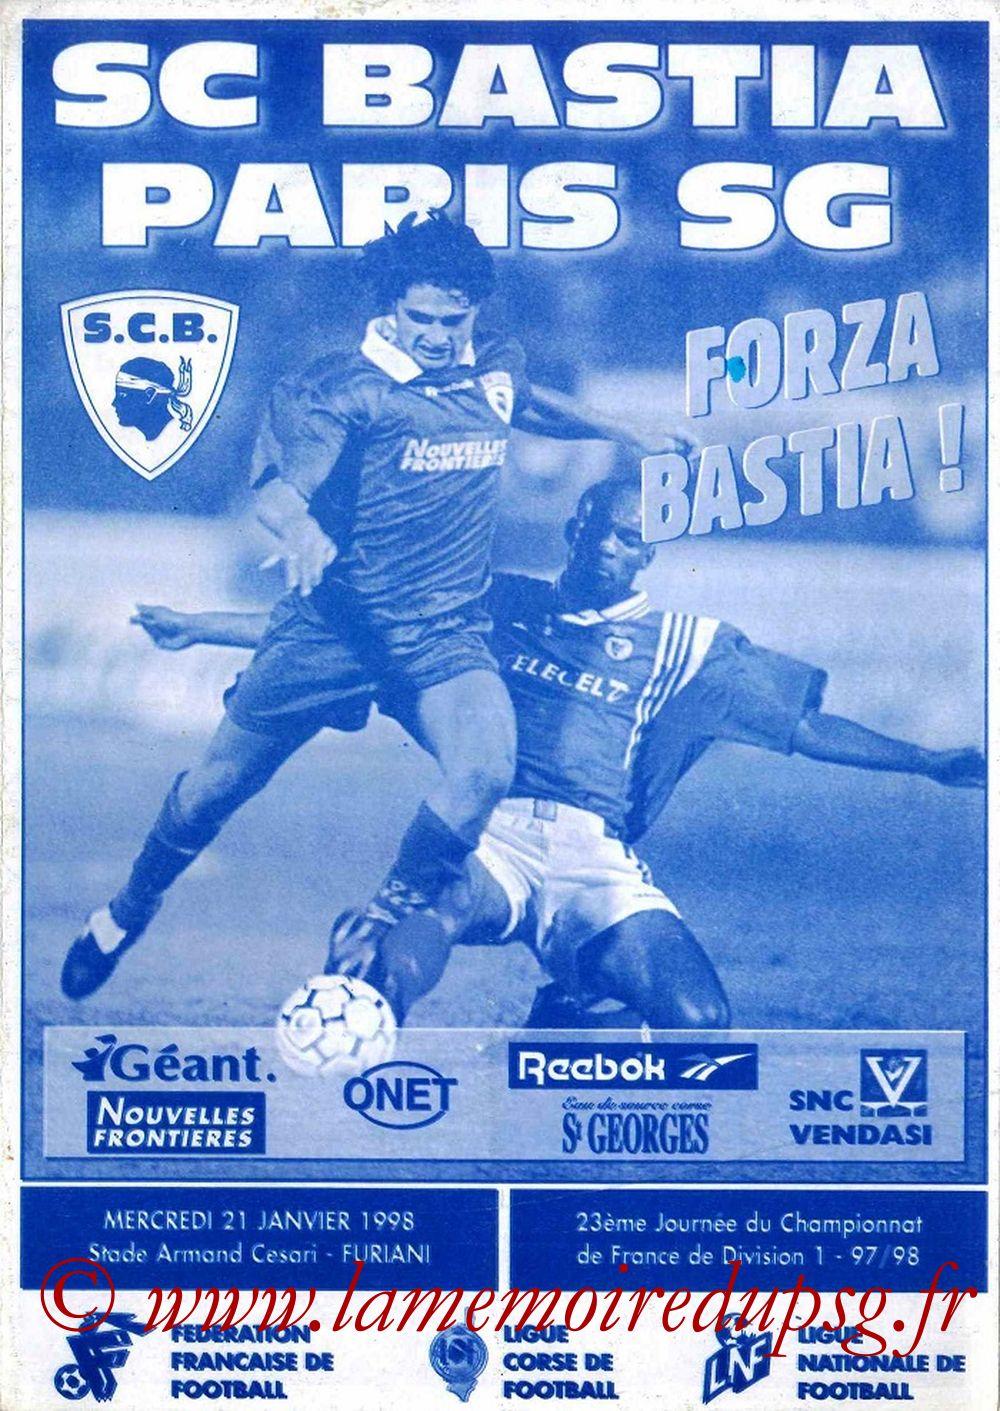 1998-01-21  Bastia-PSG (23ème D1, Forza Bastia)